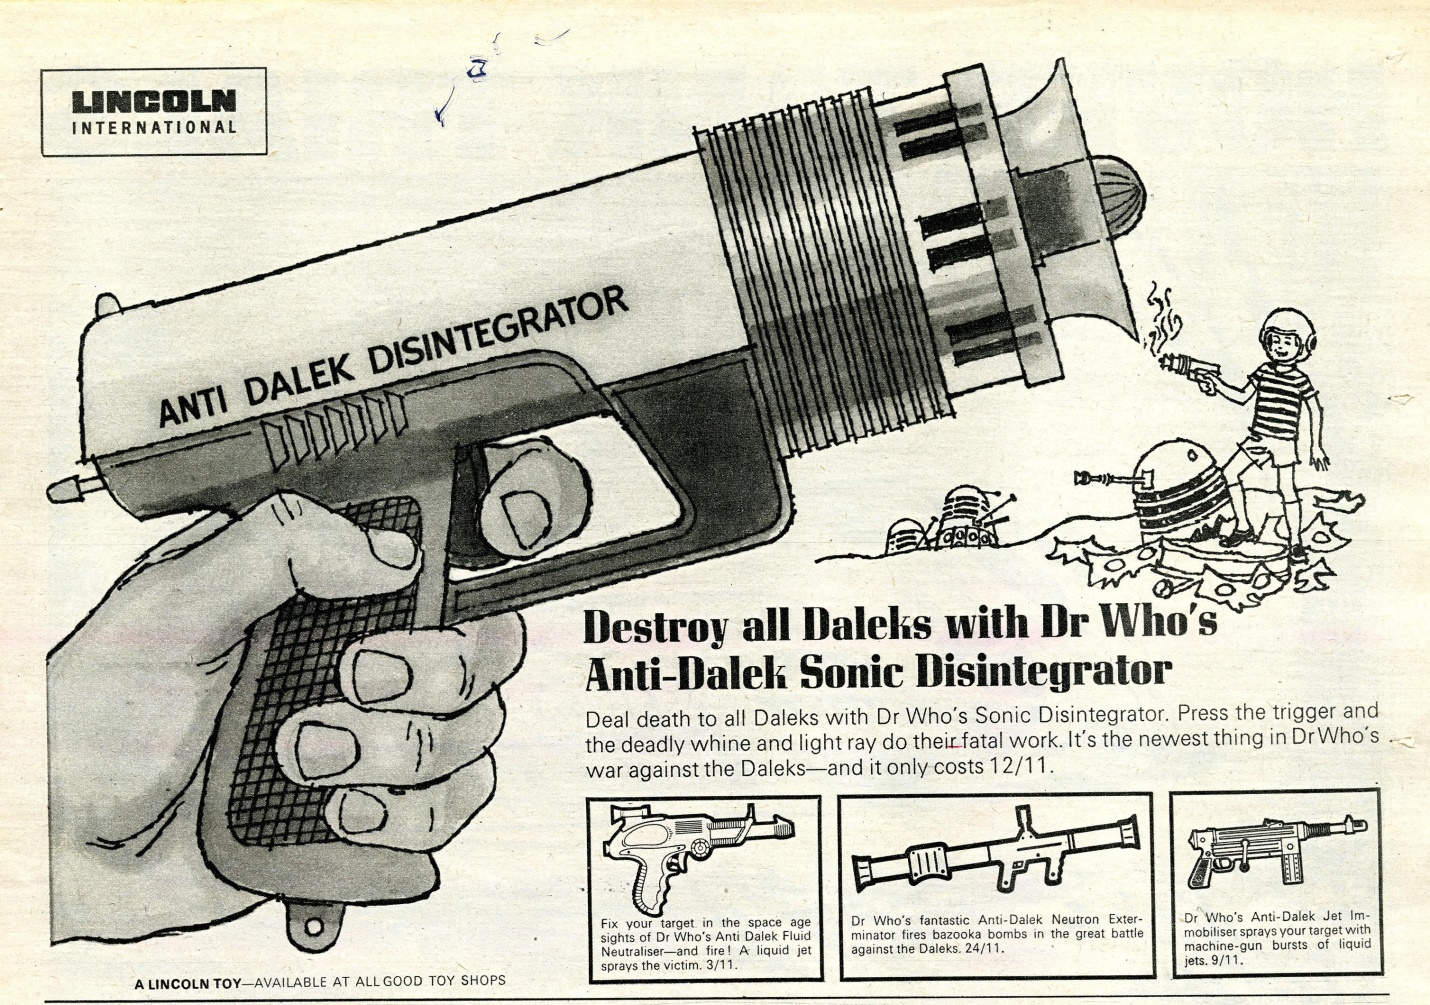 Ad. for Lincoln International Ltd. Dr. Who's Anti-Dalek Sonic Disintegrator, in TV Century 21 #65, 16 April 2066 (1966).